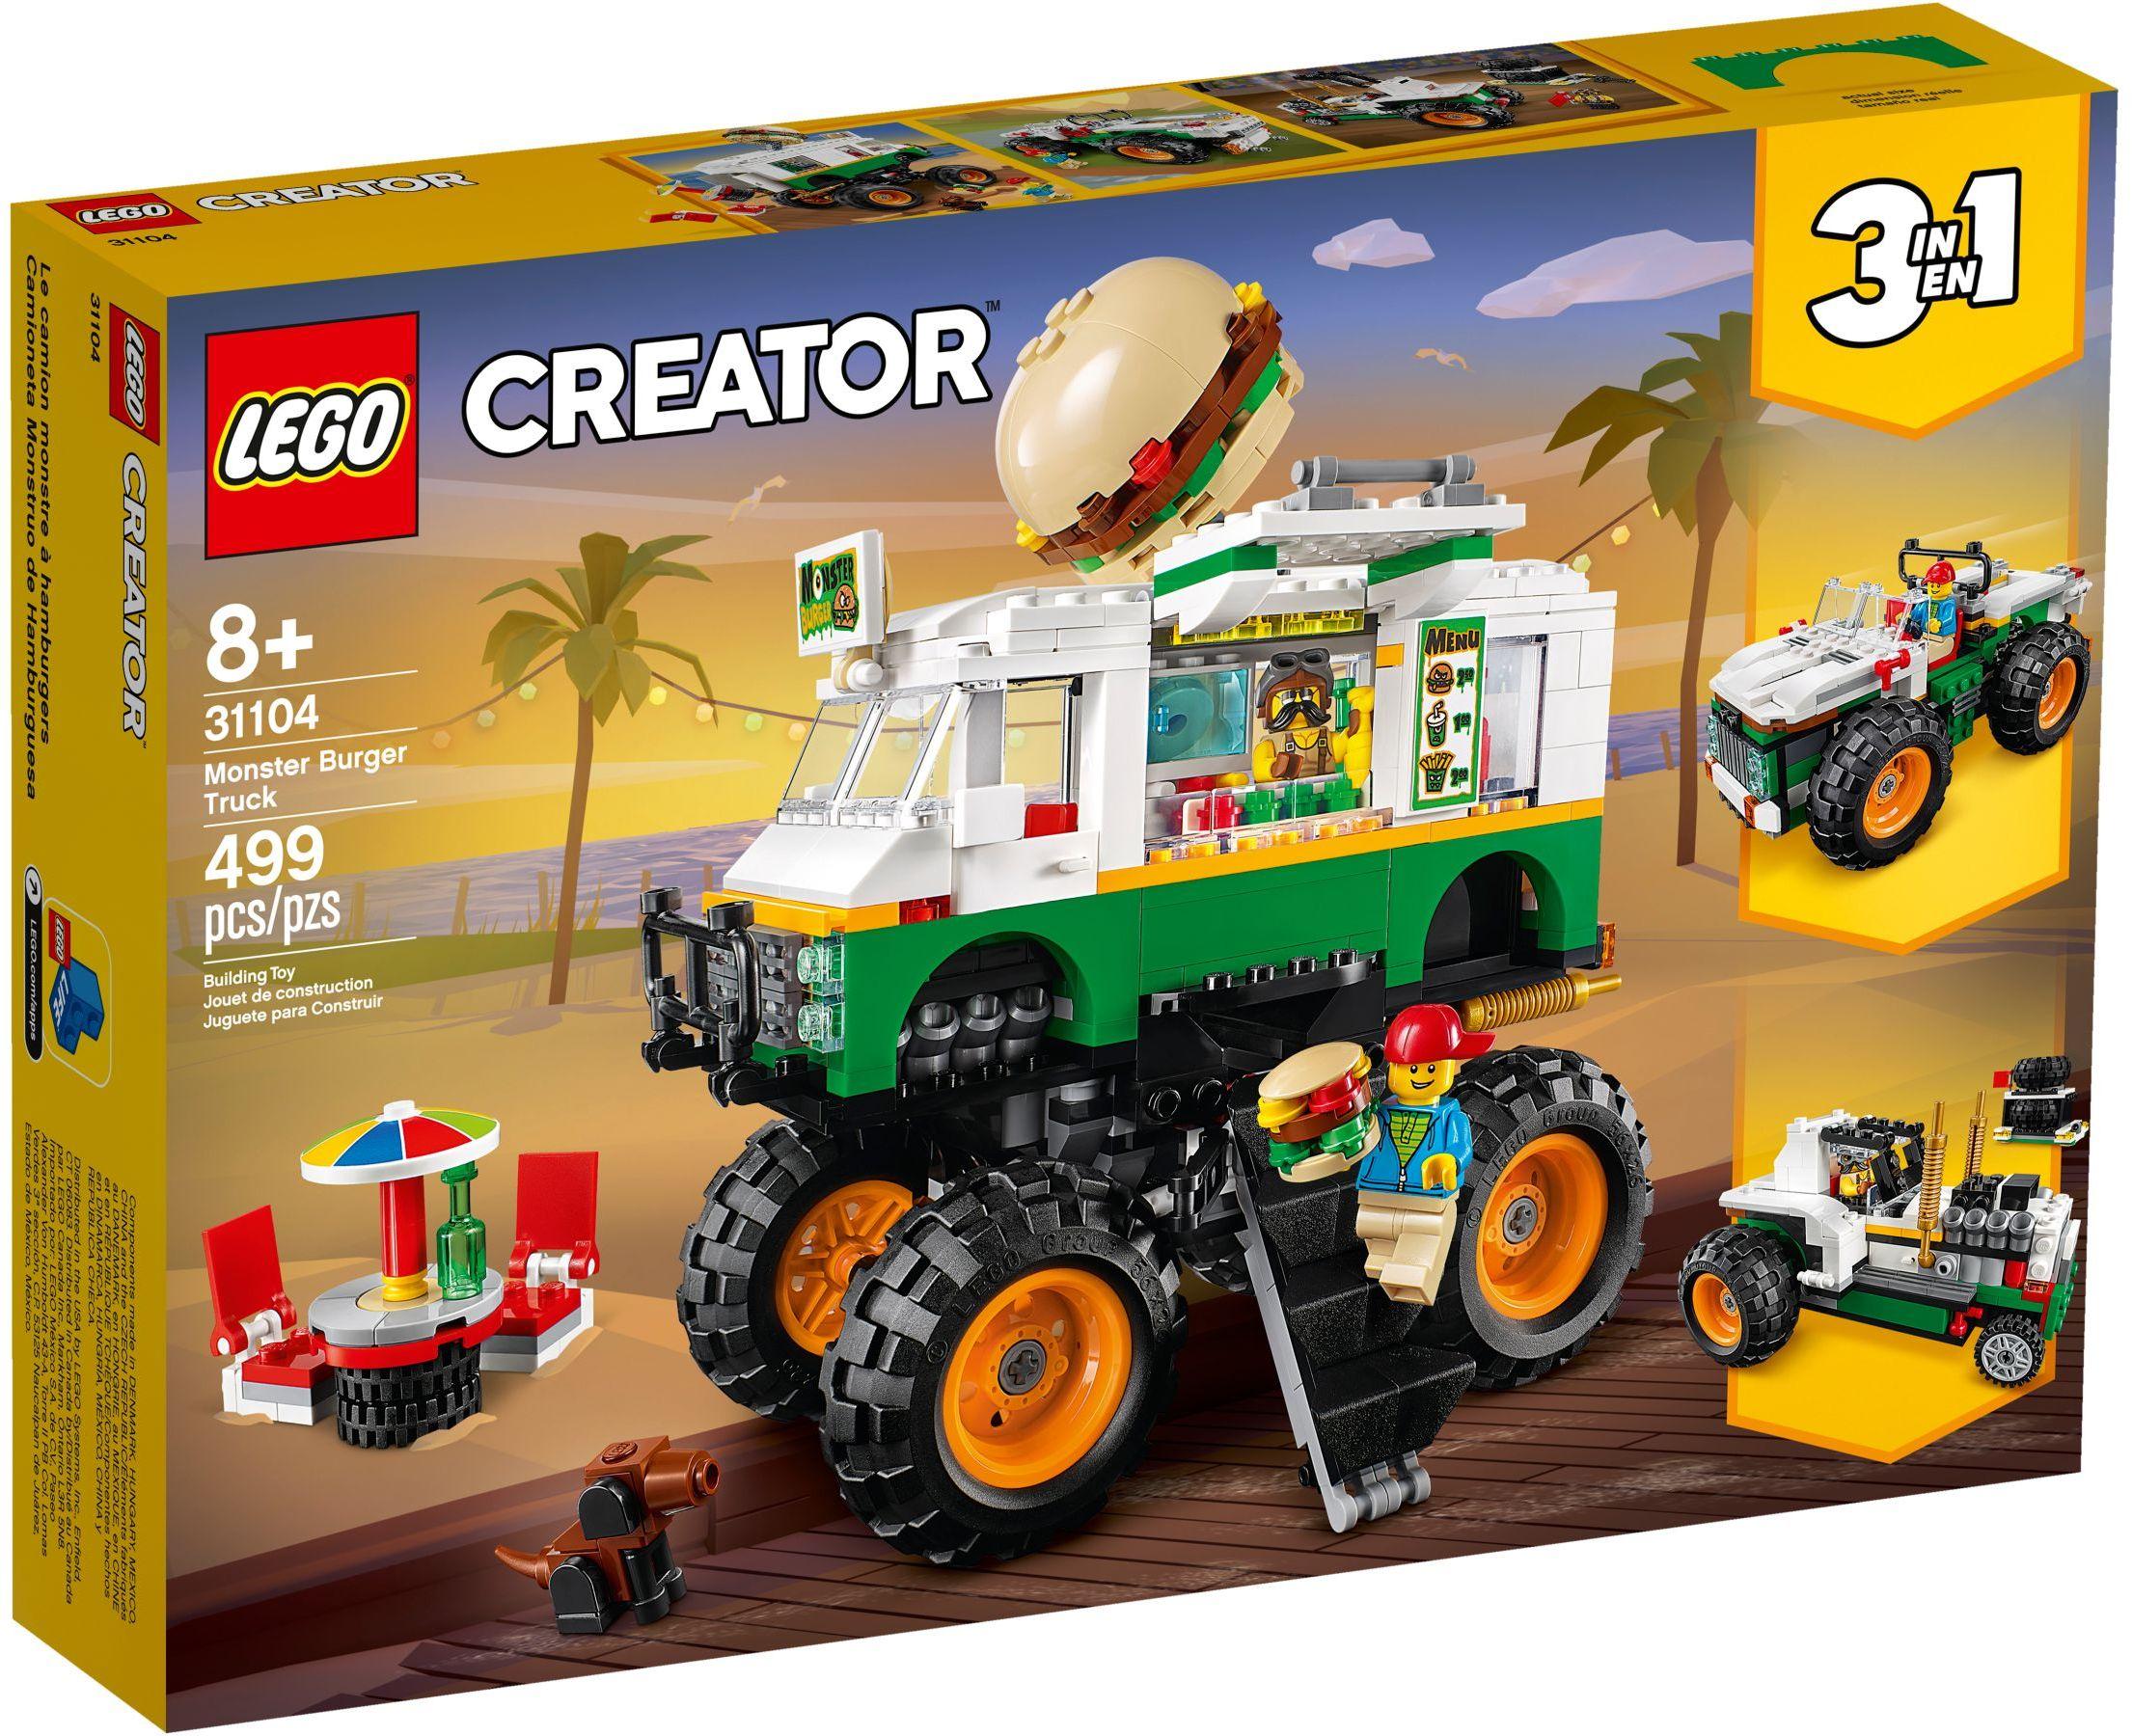 LEGO Creator - Monster Burger Truck (31104)